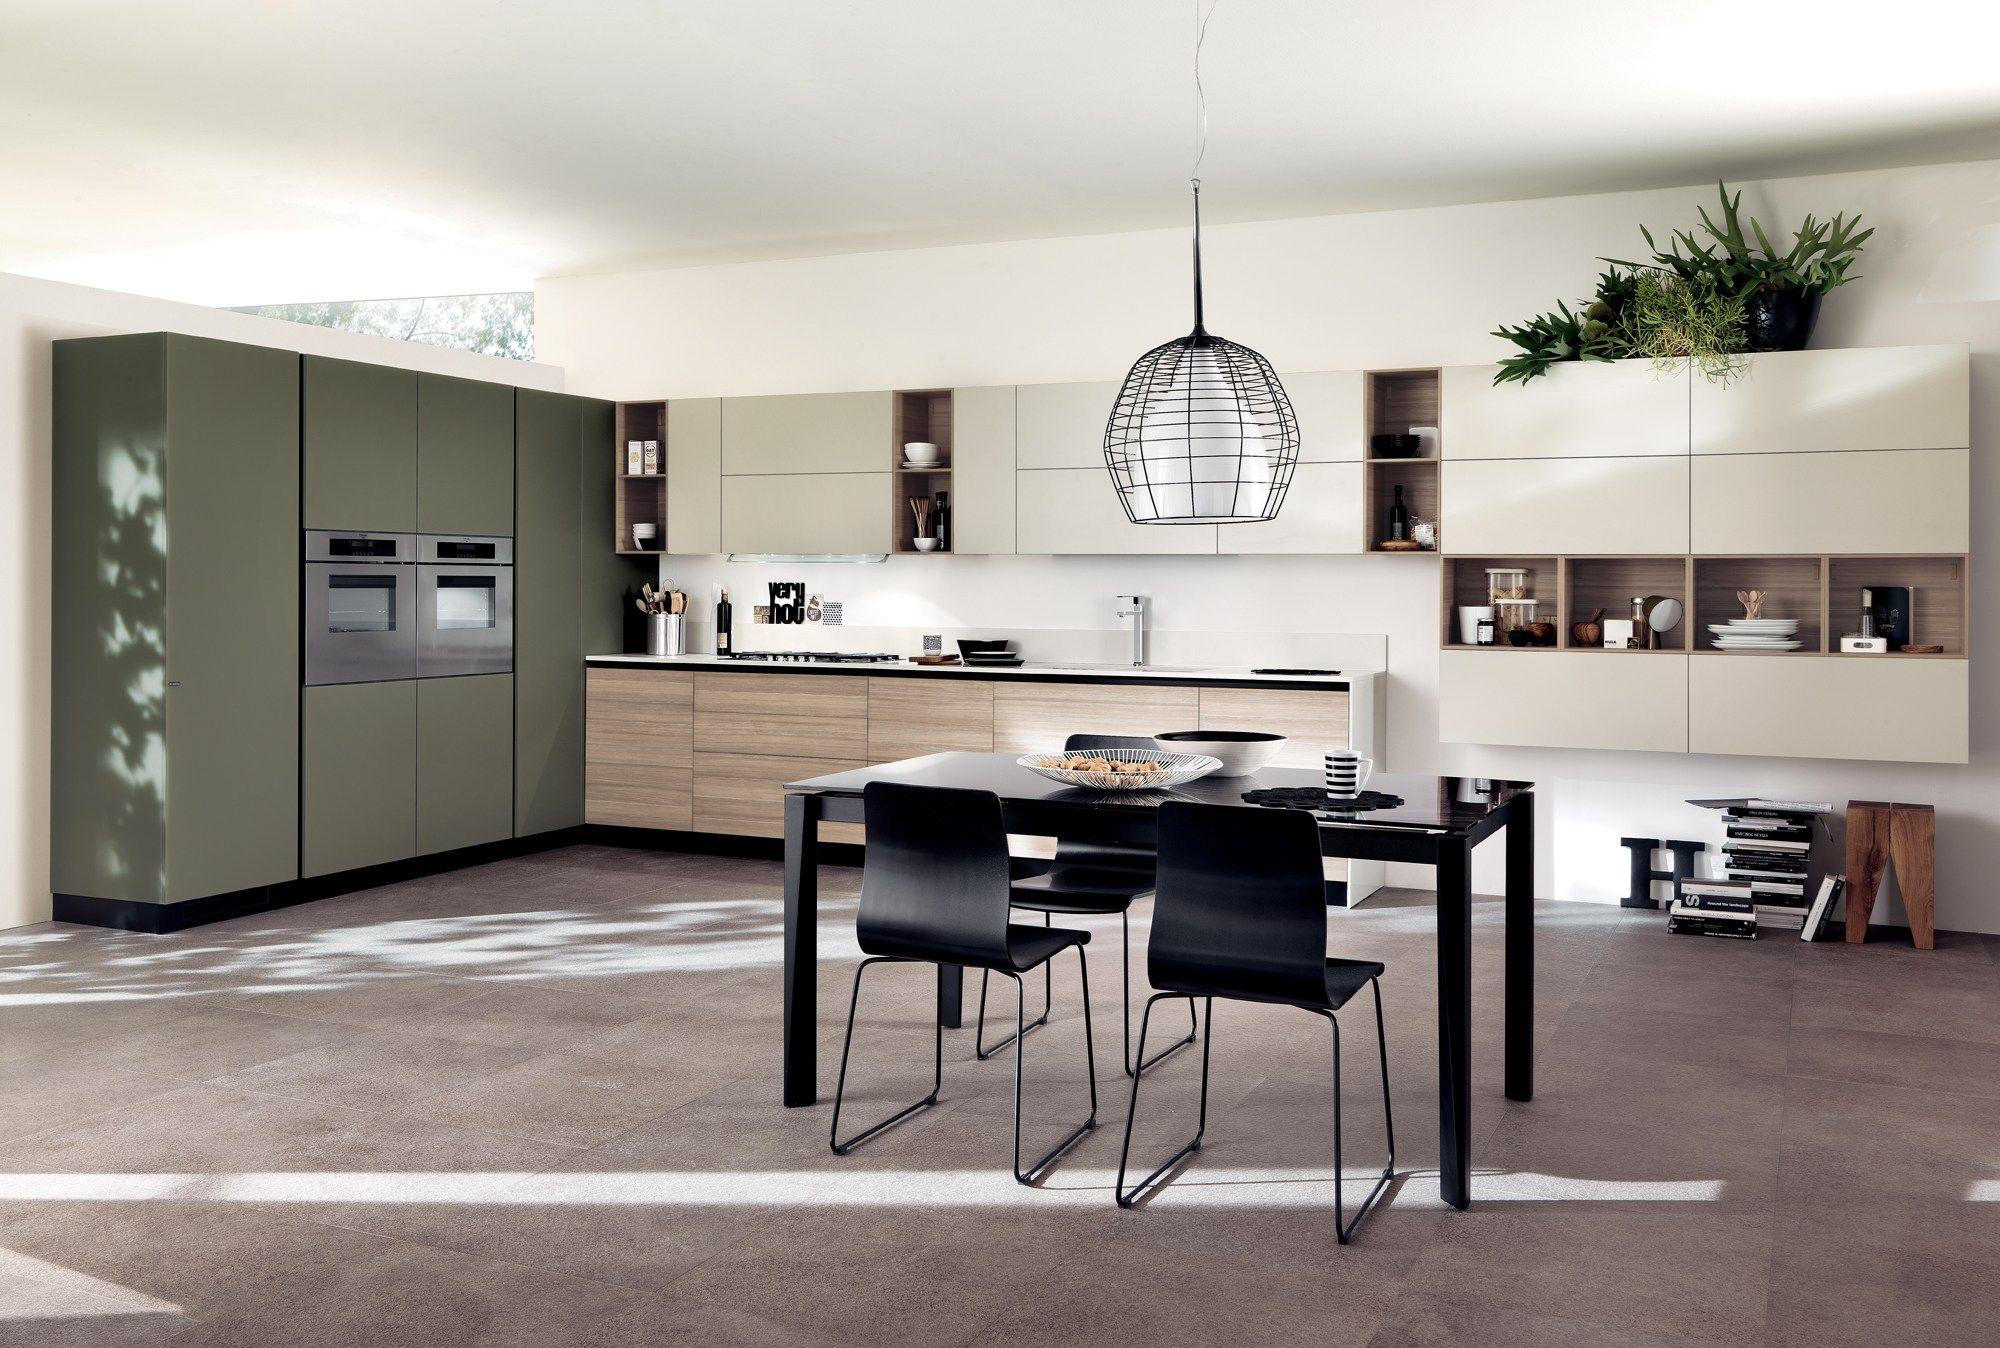 Cuisine int gr e liberamente ligne scavolini by scavolini design vuesse design - Cuisine integree ...